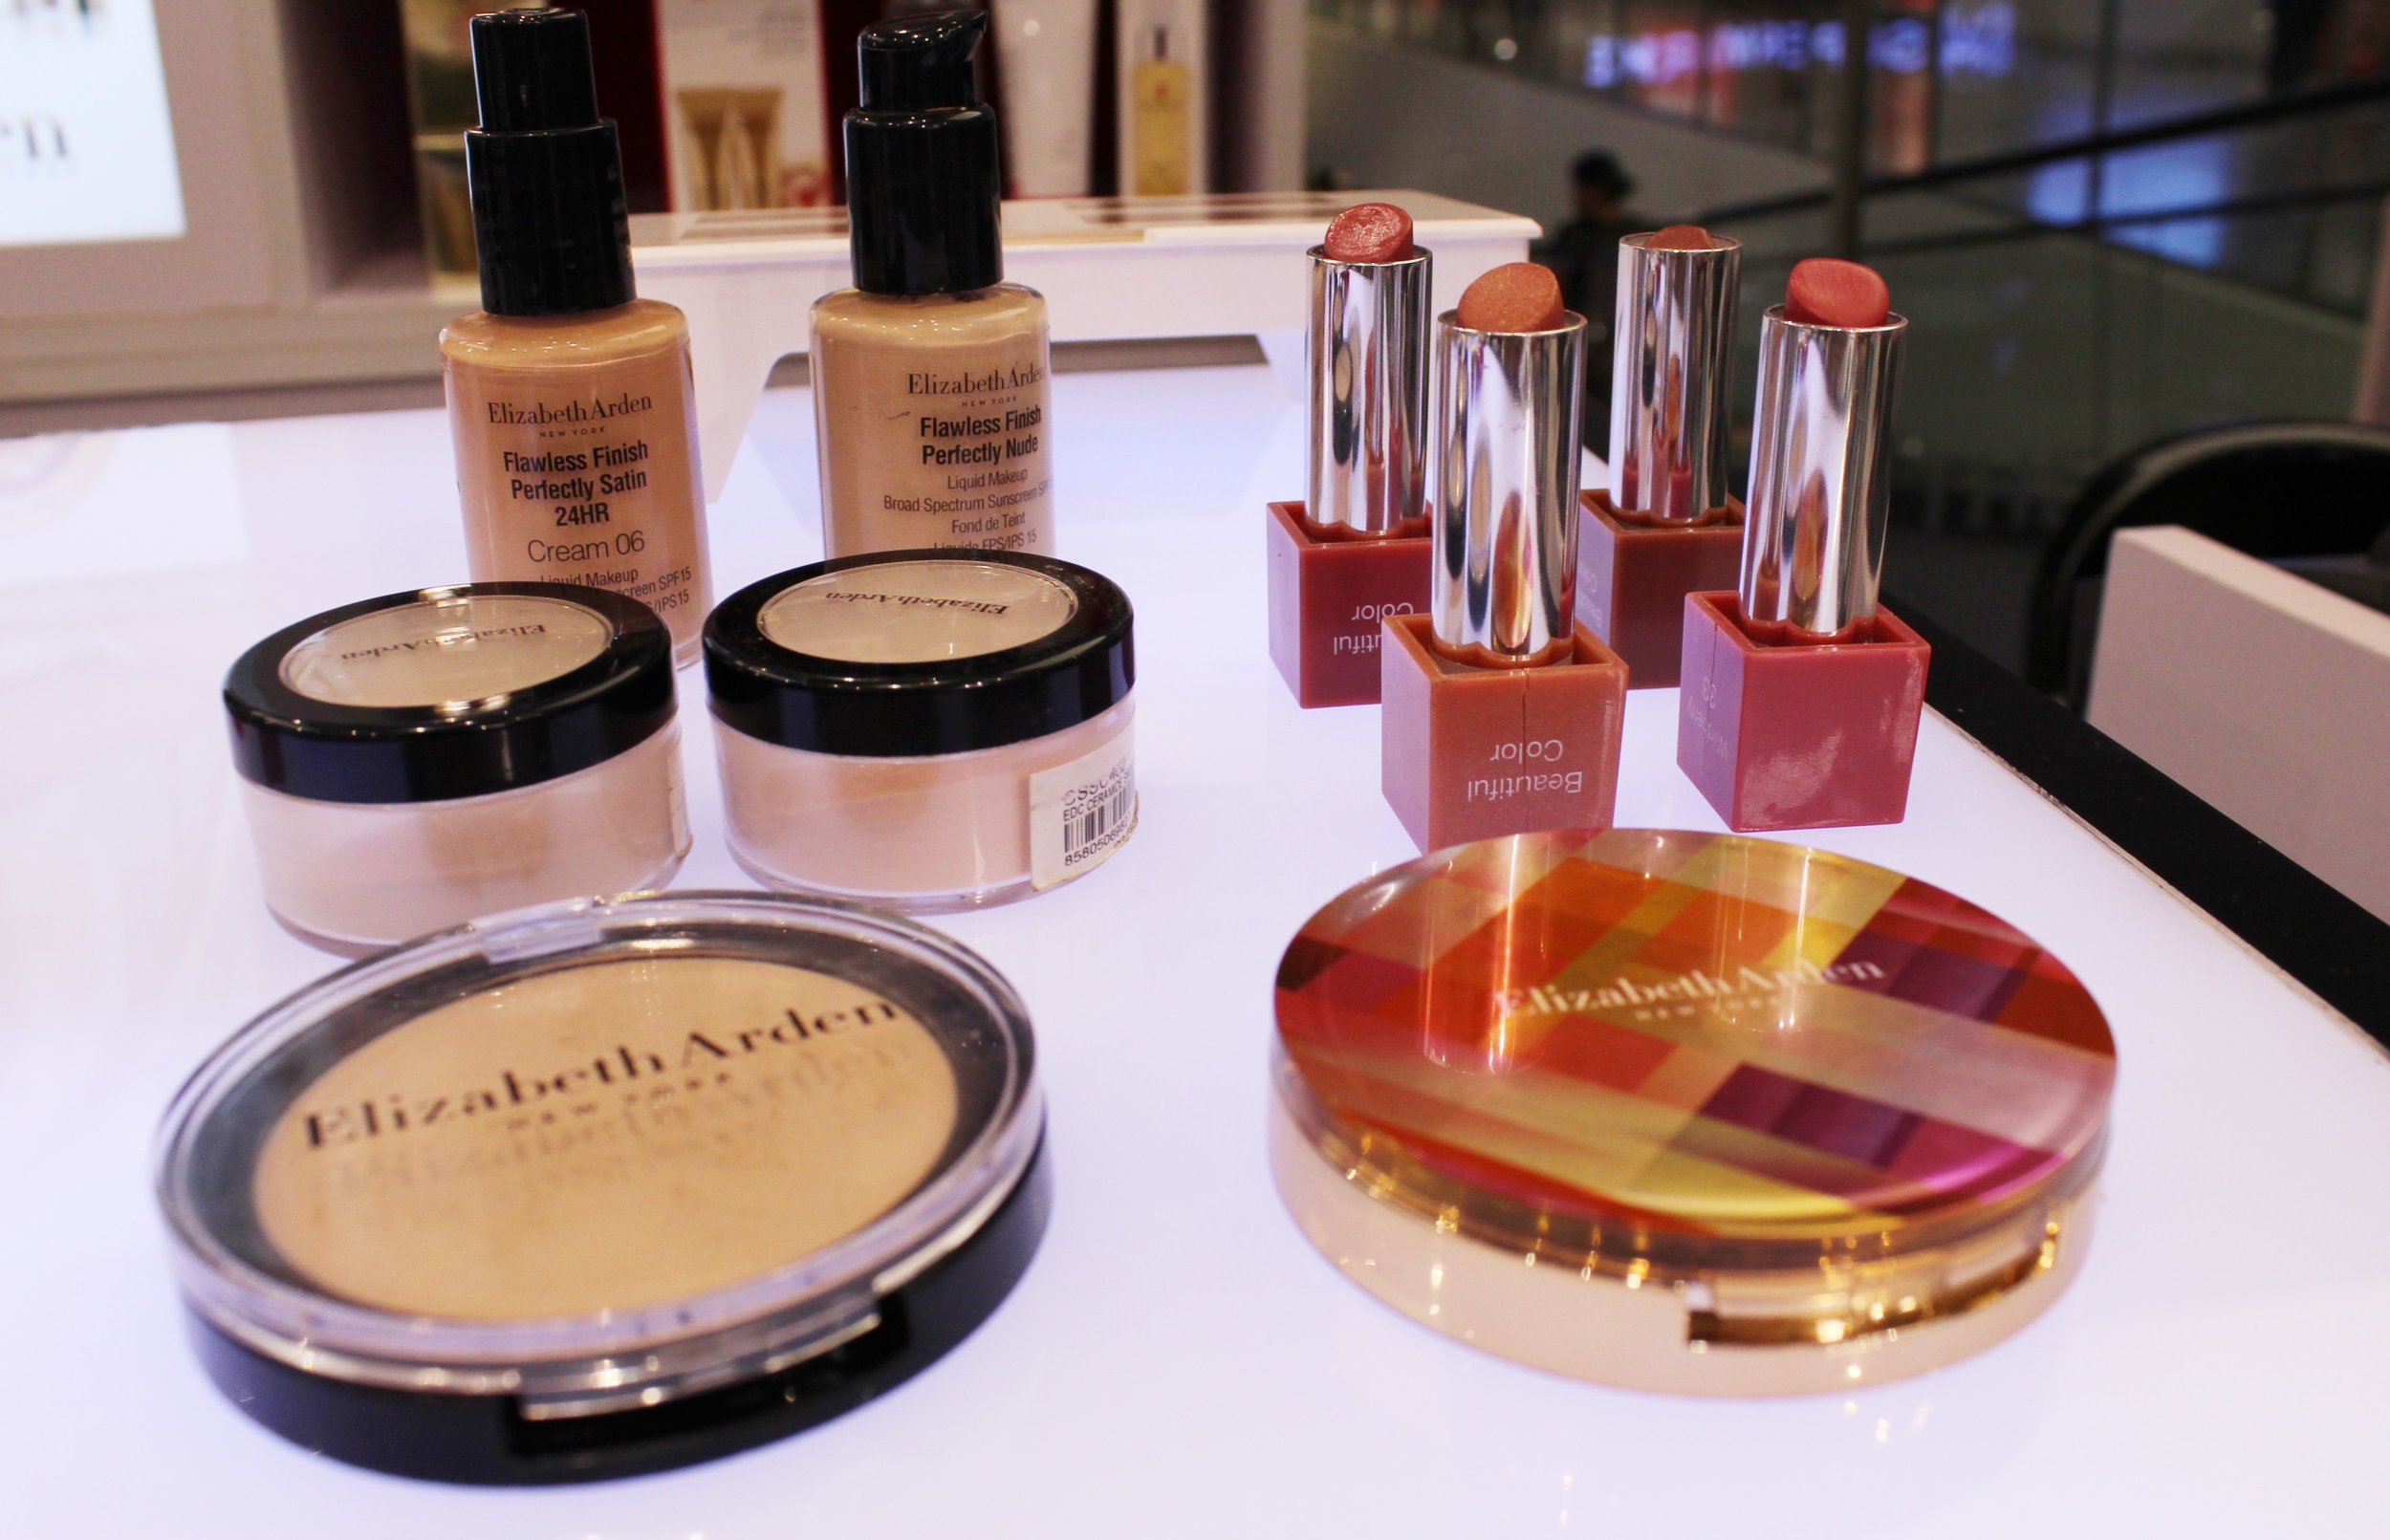 Elizabeth Arden's beauty-enhancing shades